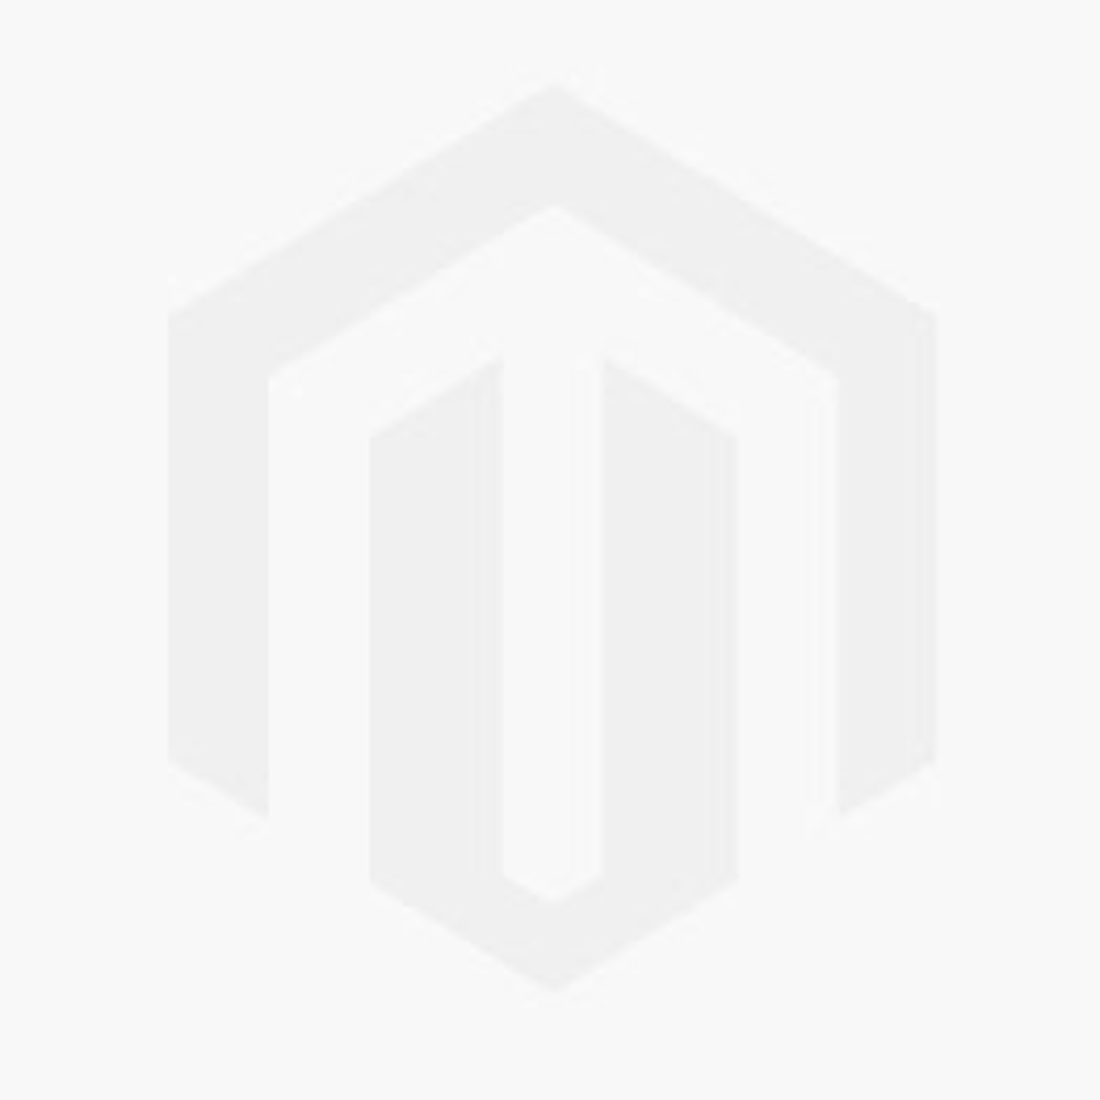 Albert Irvin OBE RA Untitled opus w.14 (framed)